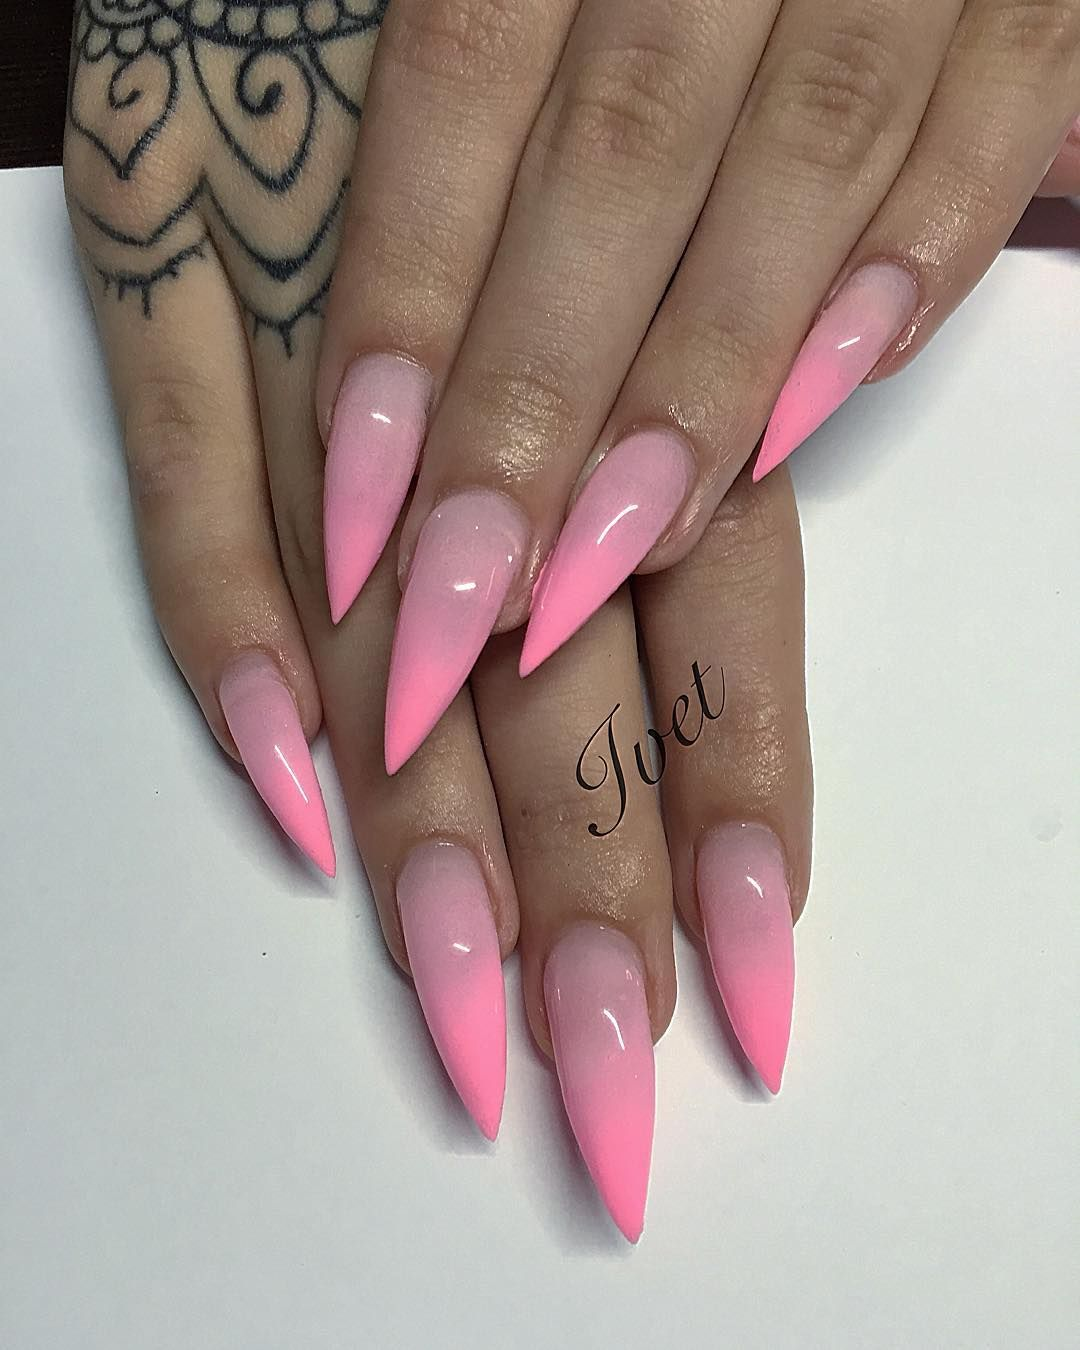 Hair amp nail choices aiibeauty -  Acrylnails Sneakerpolitics Swarovskinails Silver Sommernails Nail Nailart Nsilsart